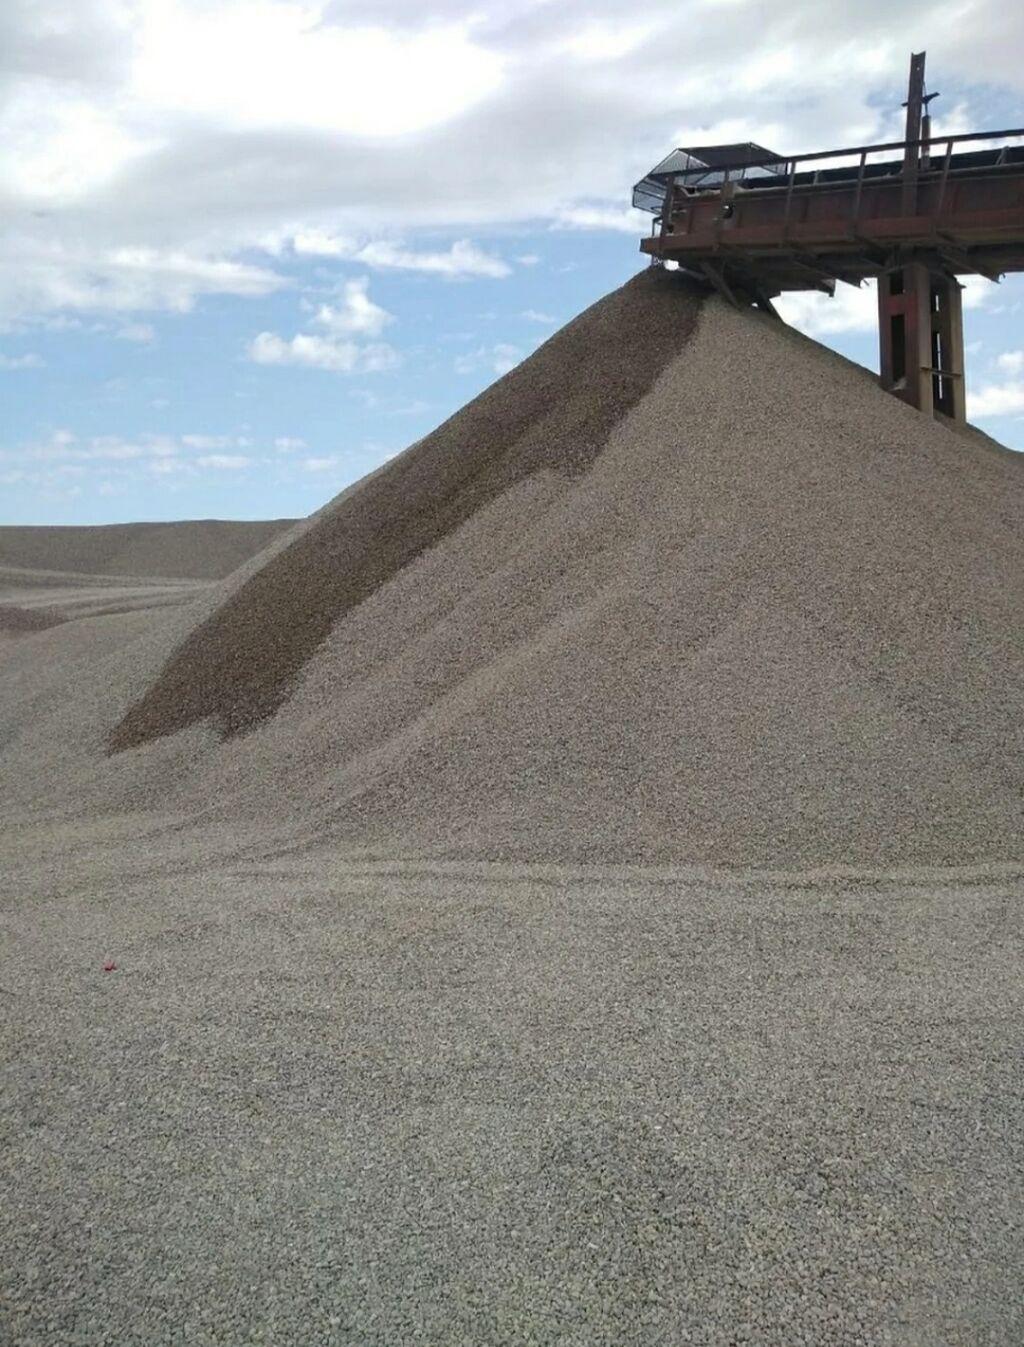 Зил По городу   Борт 8 кг.   Доставка щебня, угля, песка, чернозема, отсев: Зил По городу   Борт 8 кг.   Доставка щебня, угля, песка, чернозема, отсев